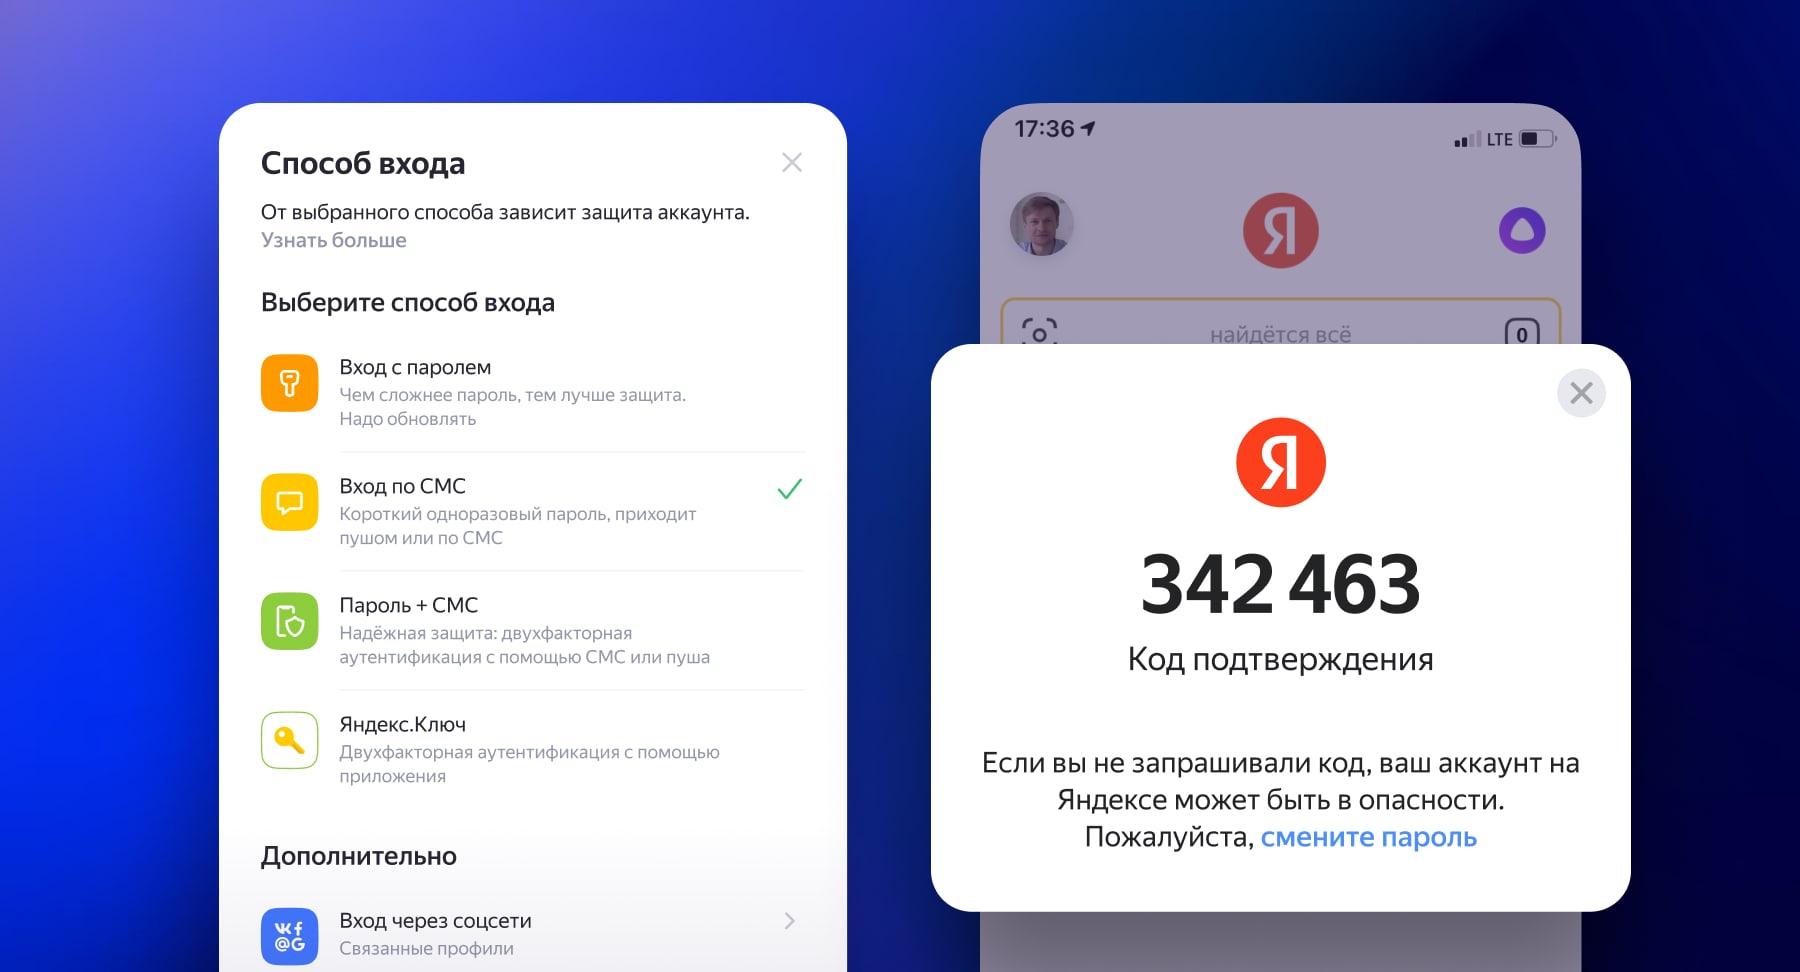 Яндекс усилил защиту аккаунтов – Яндекс ID